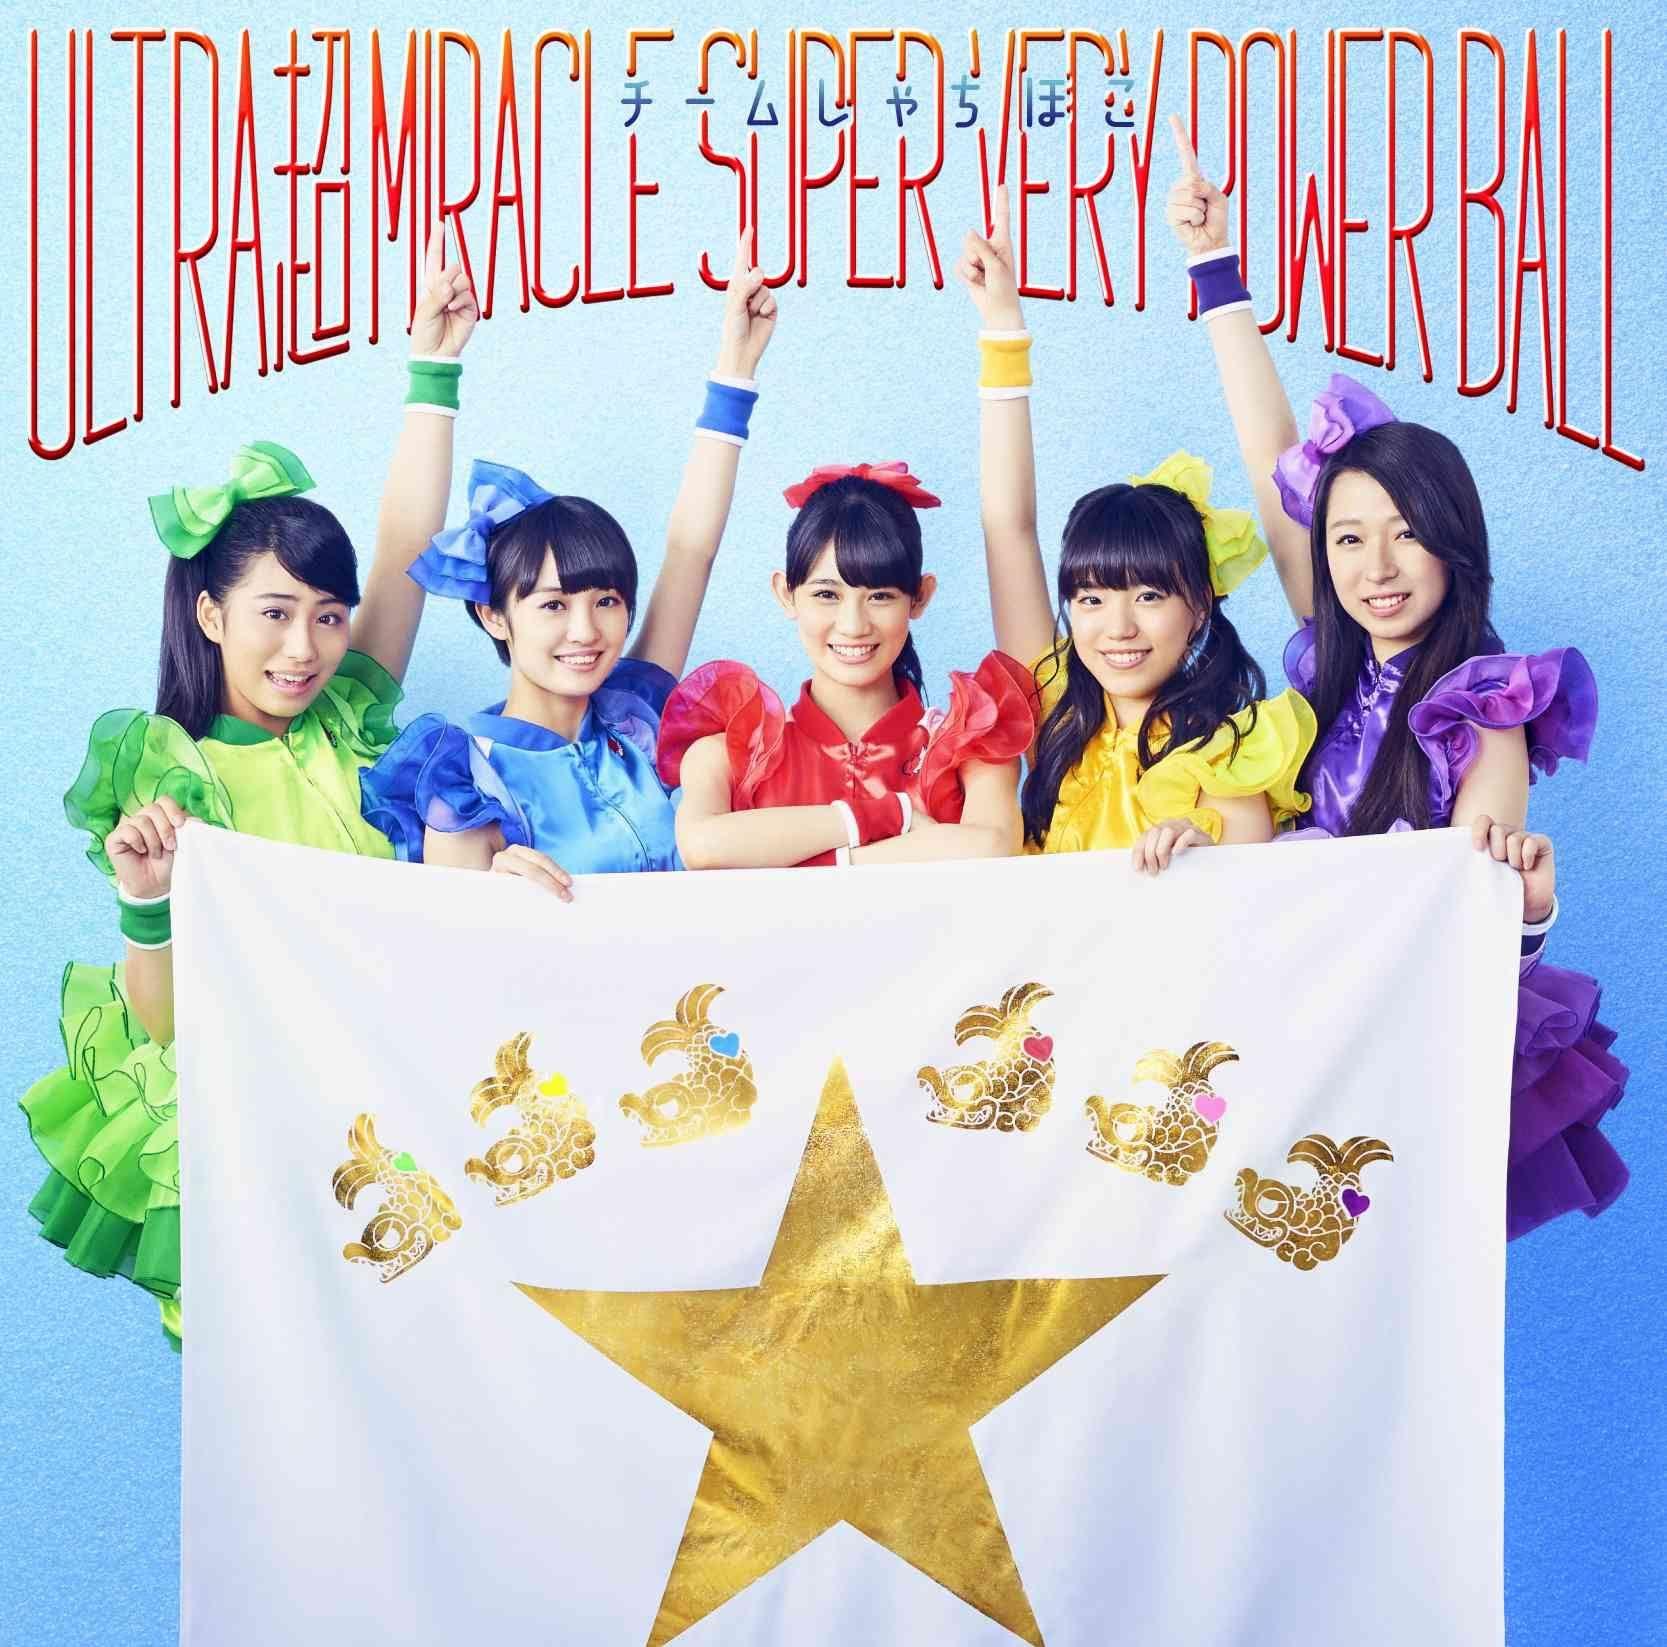 「ULTRA 超 MIRACLE SUPER VERY POWER BALL」初回限定盤Bジャケット